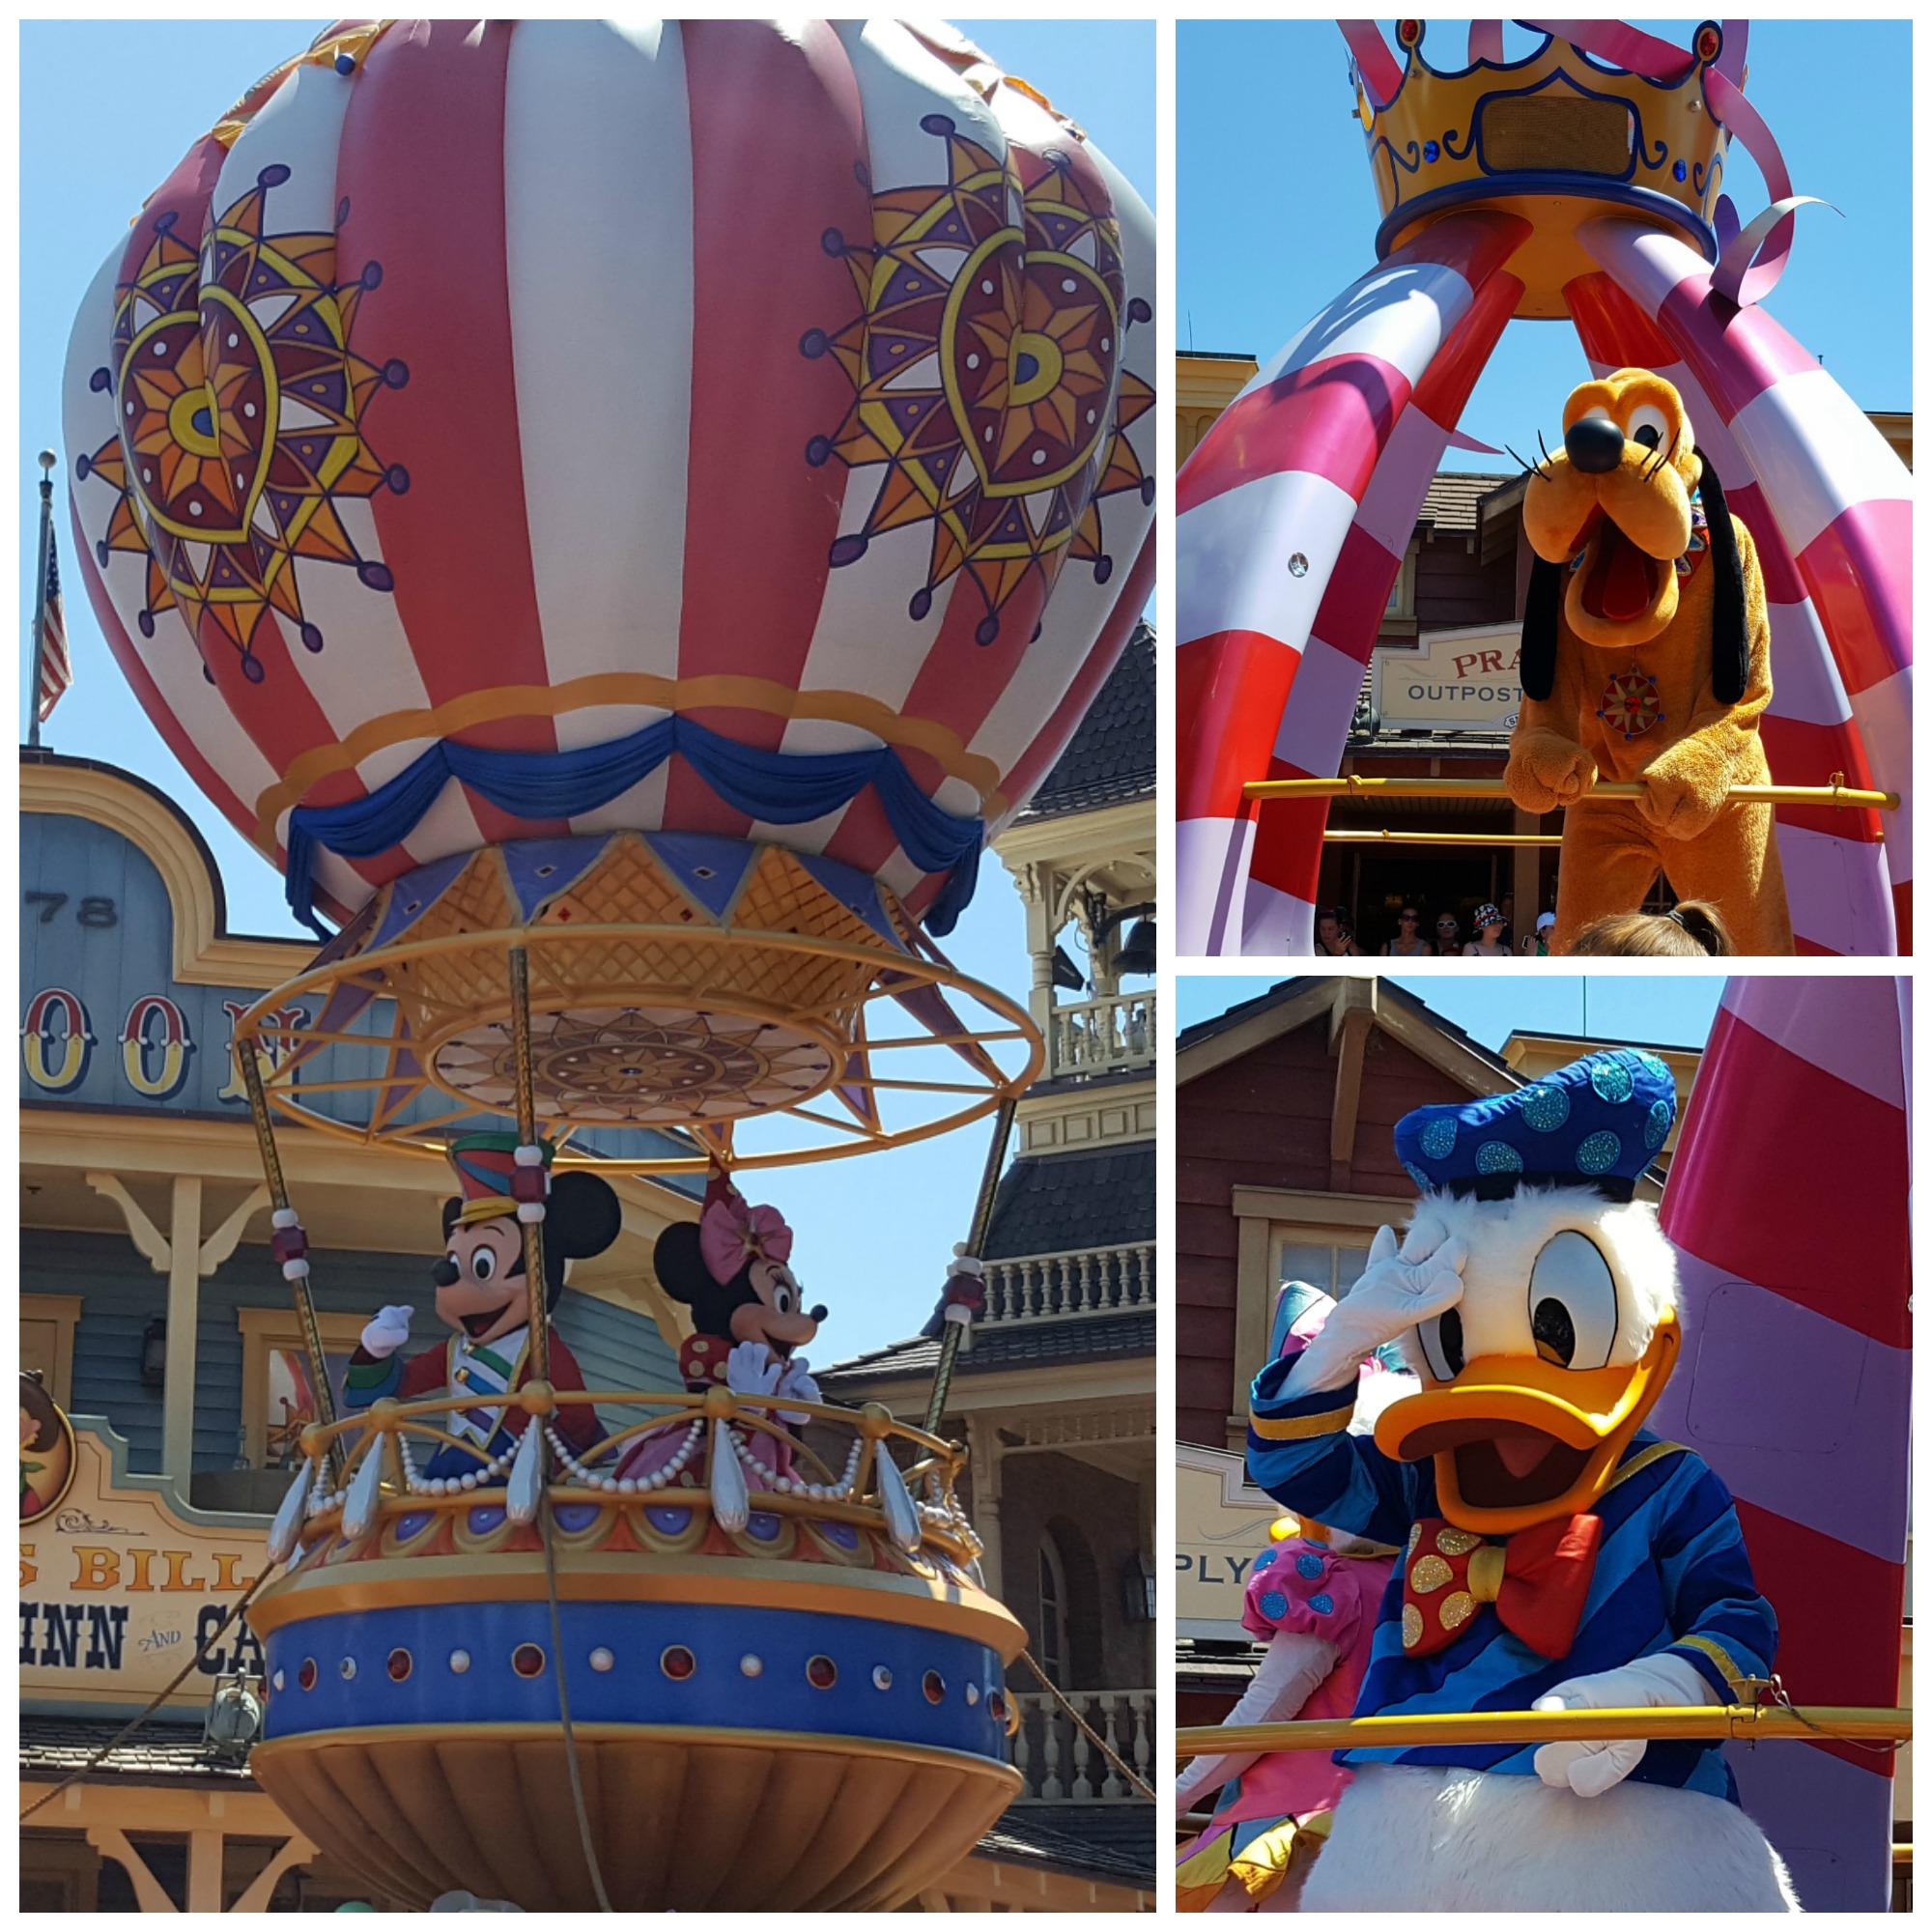 Paraden i Disneyland Orlando